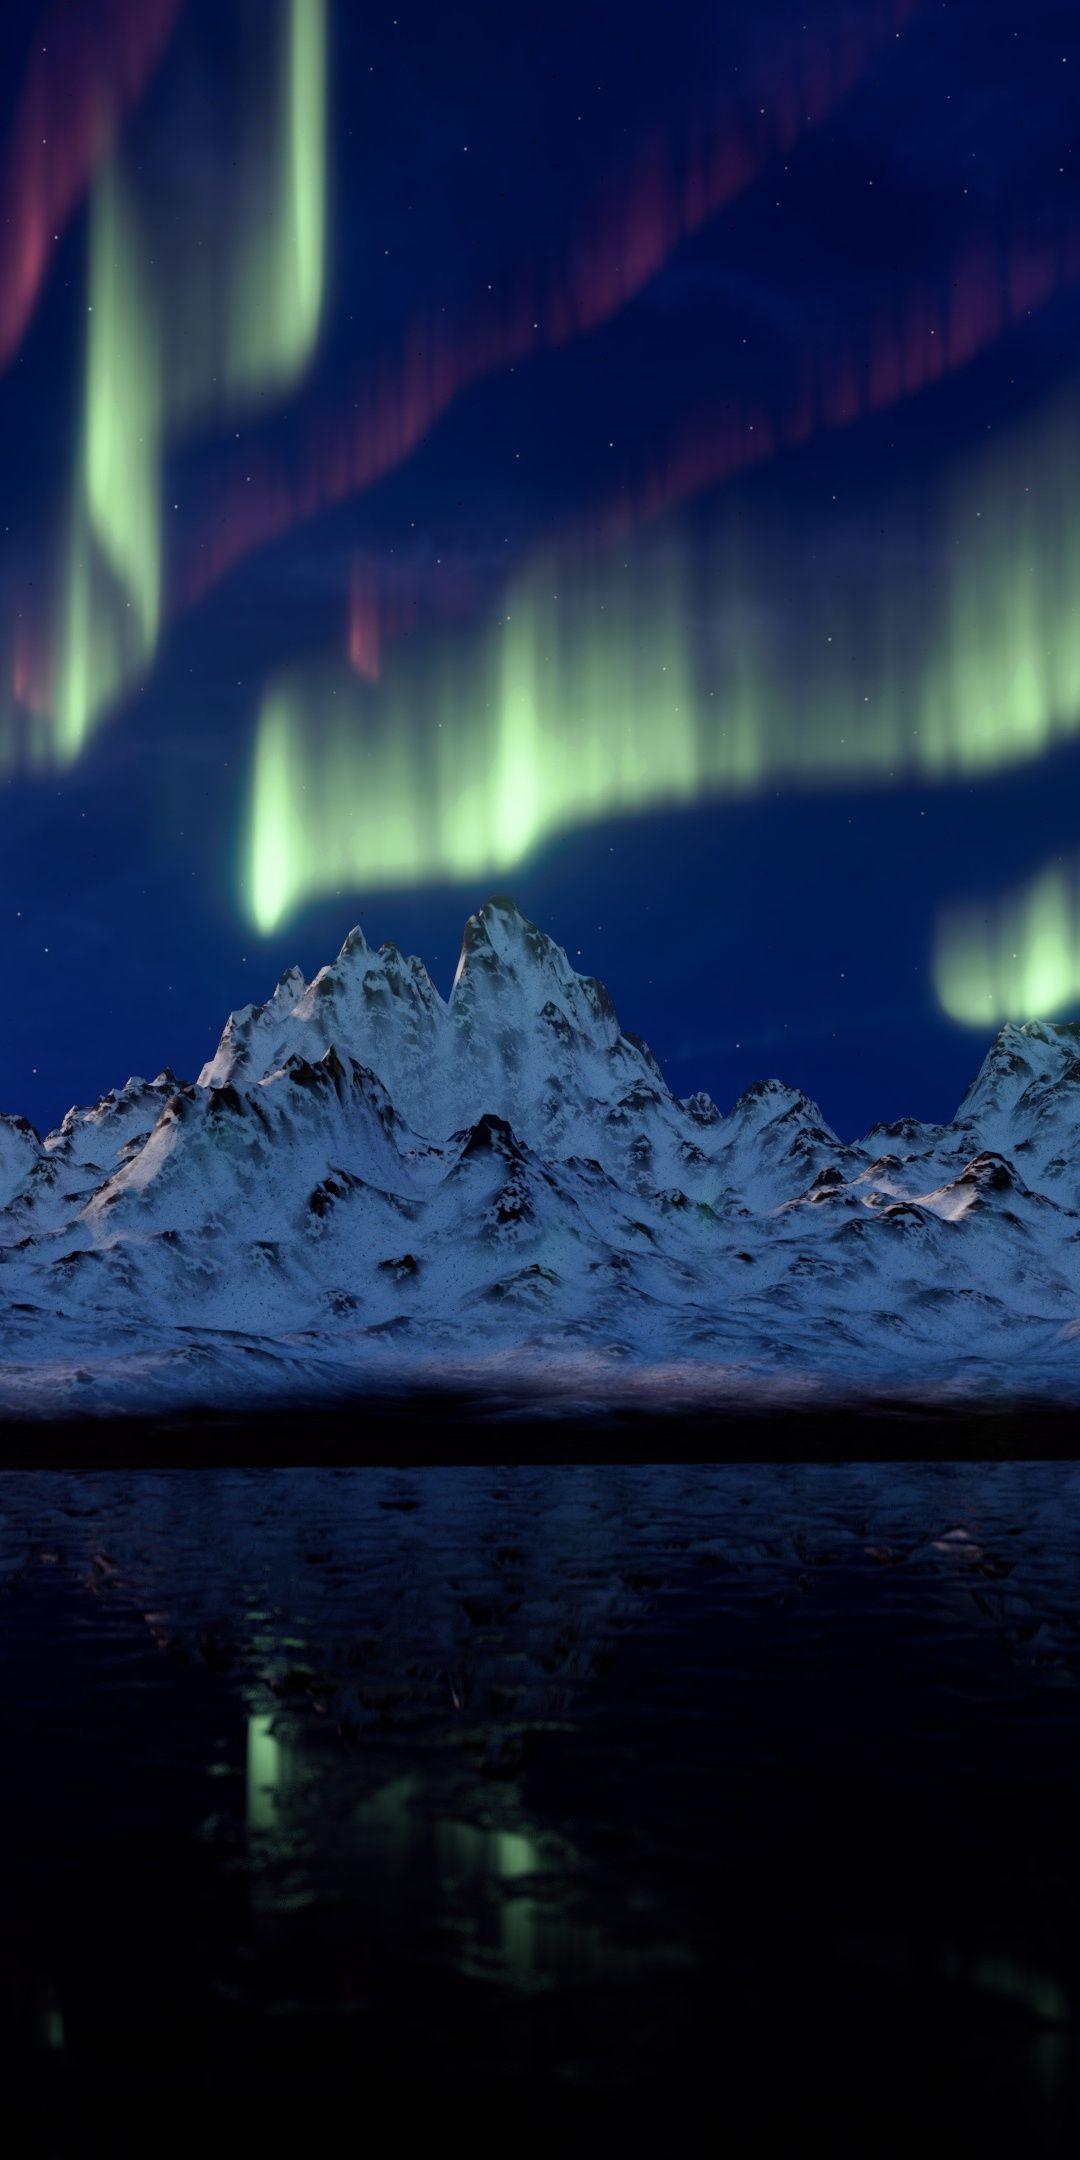 1080x2160 Nature, mountains, Northern Lights, Aurora